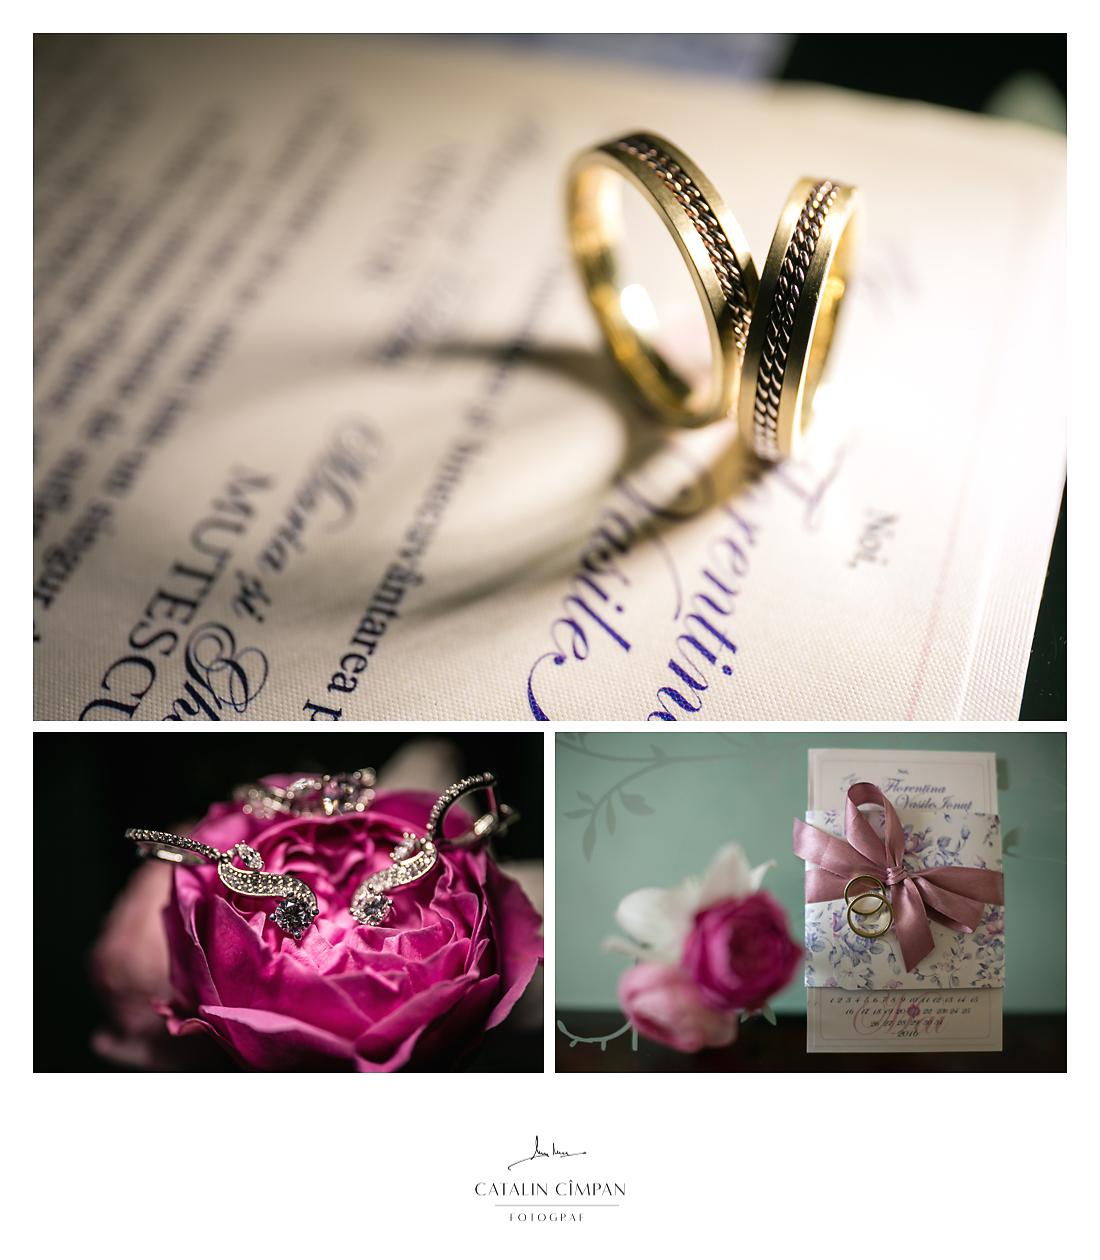 Florentina-Ionut-fotografii-nunta-02